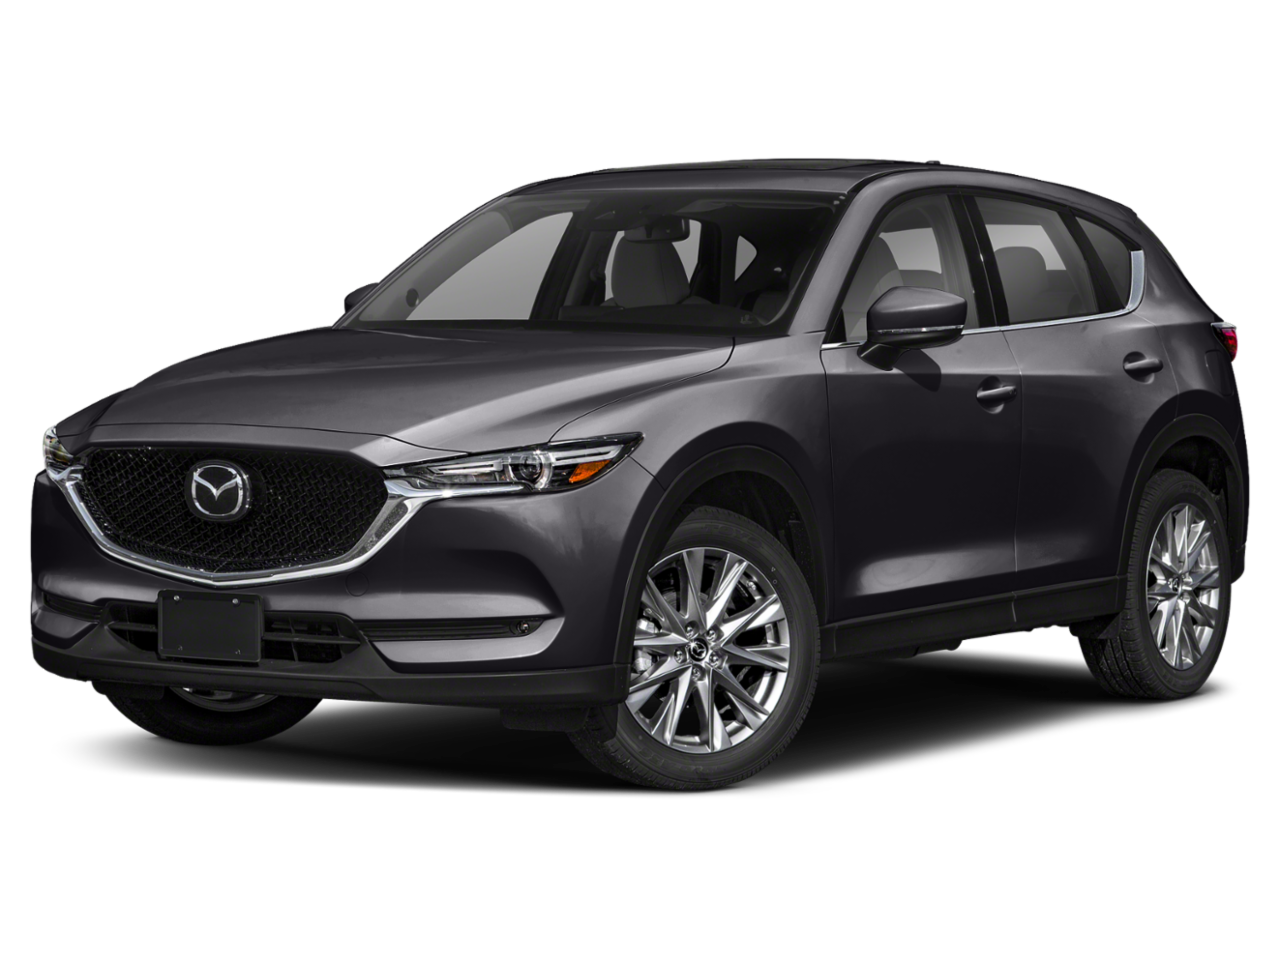 New 2019 Mazda CX-5 Grand Touring